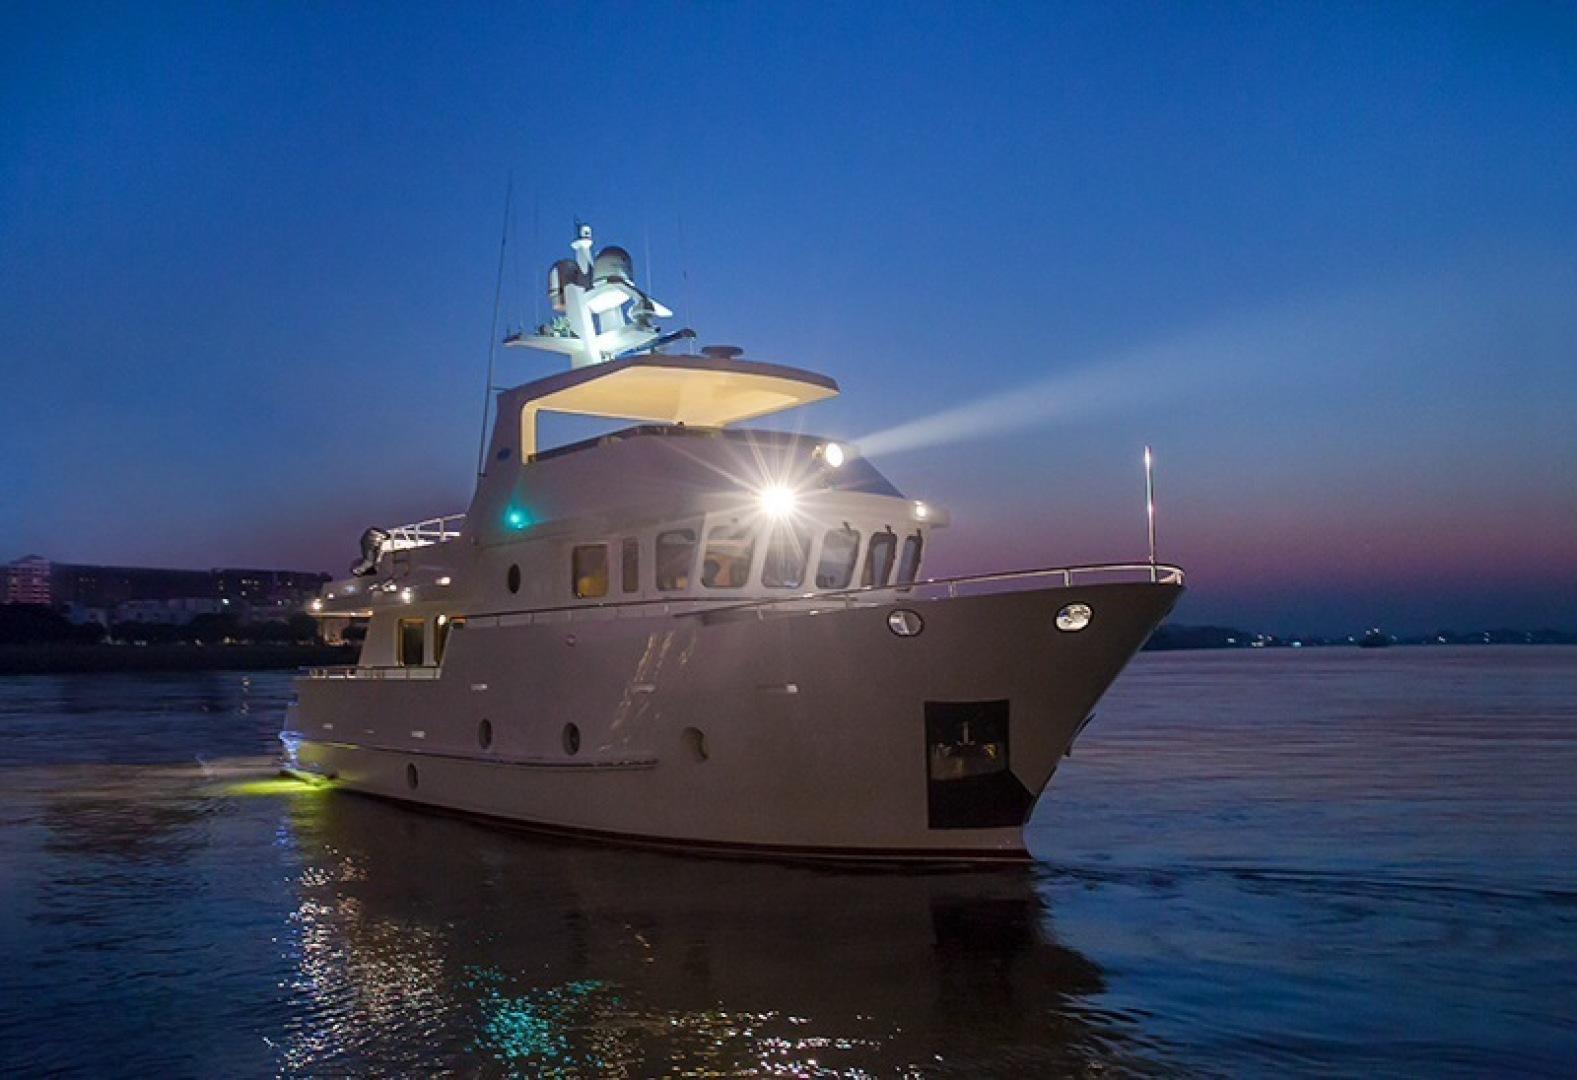 Bering-65 Bering Yacht 2013-Namaste Dania-Florida-United States-1401058   Thumbnail